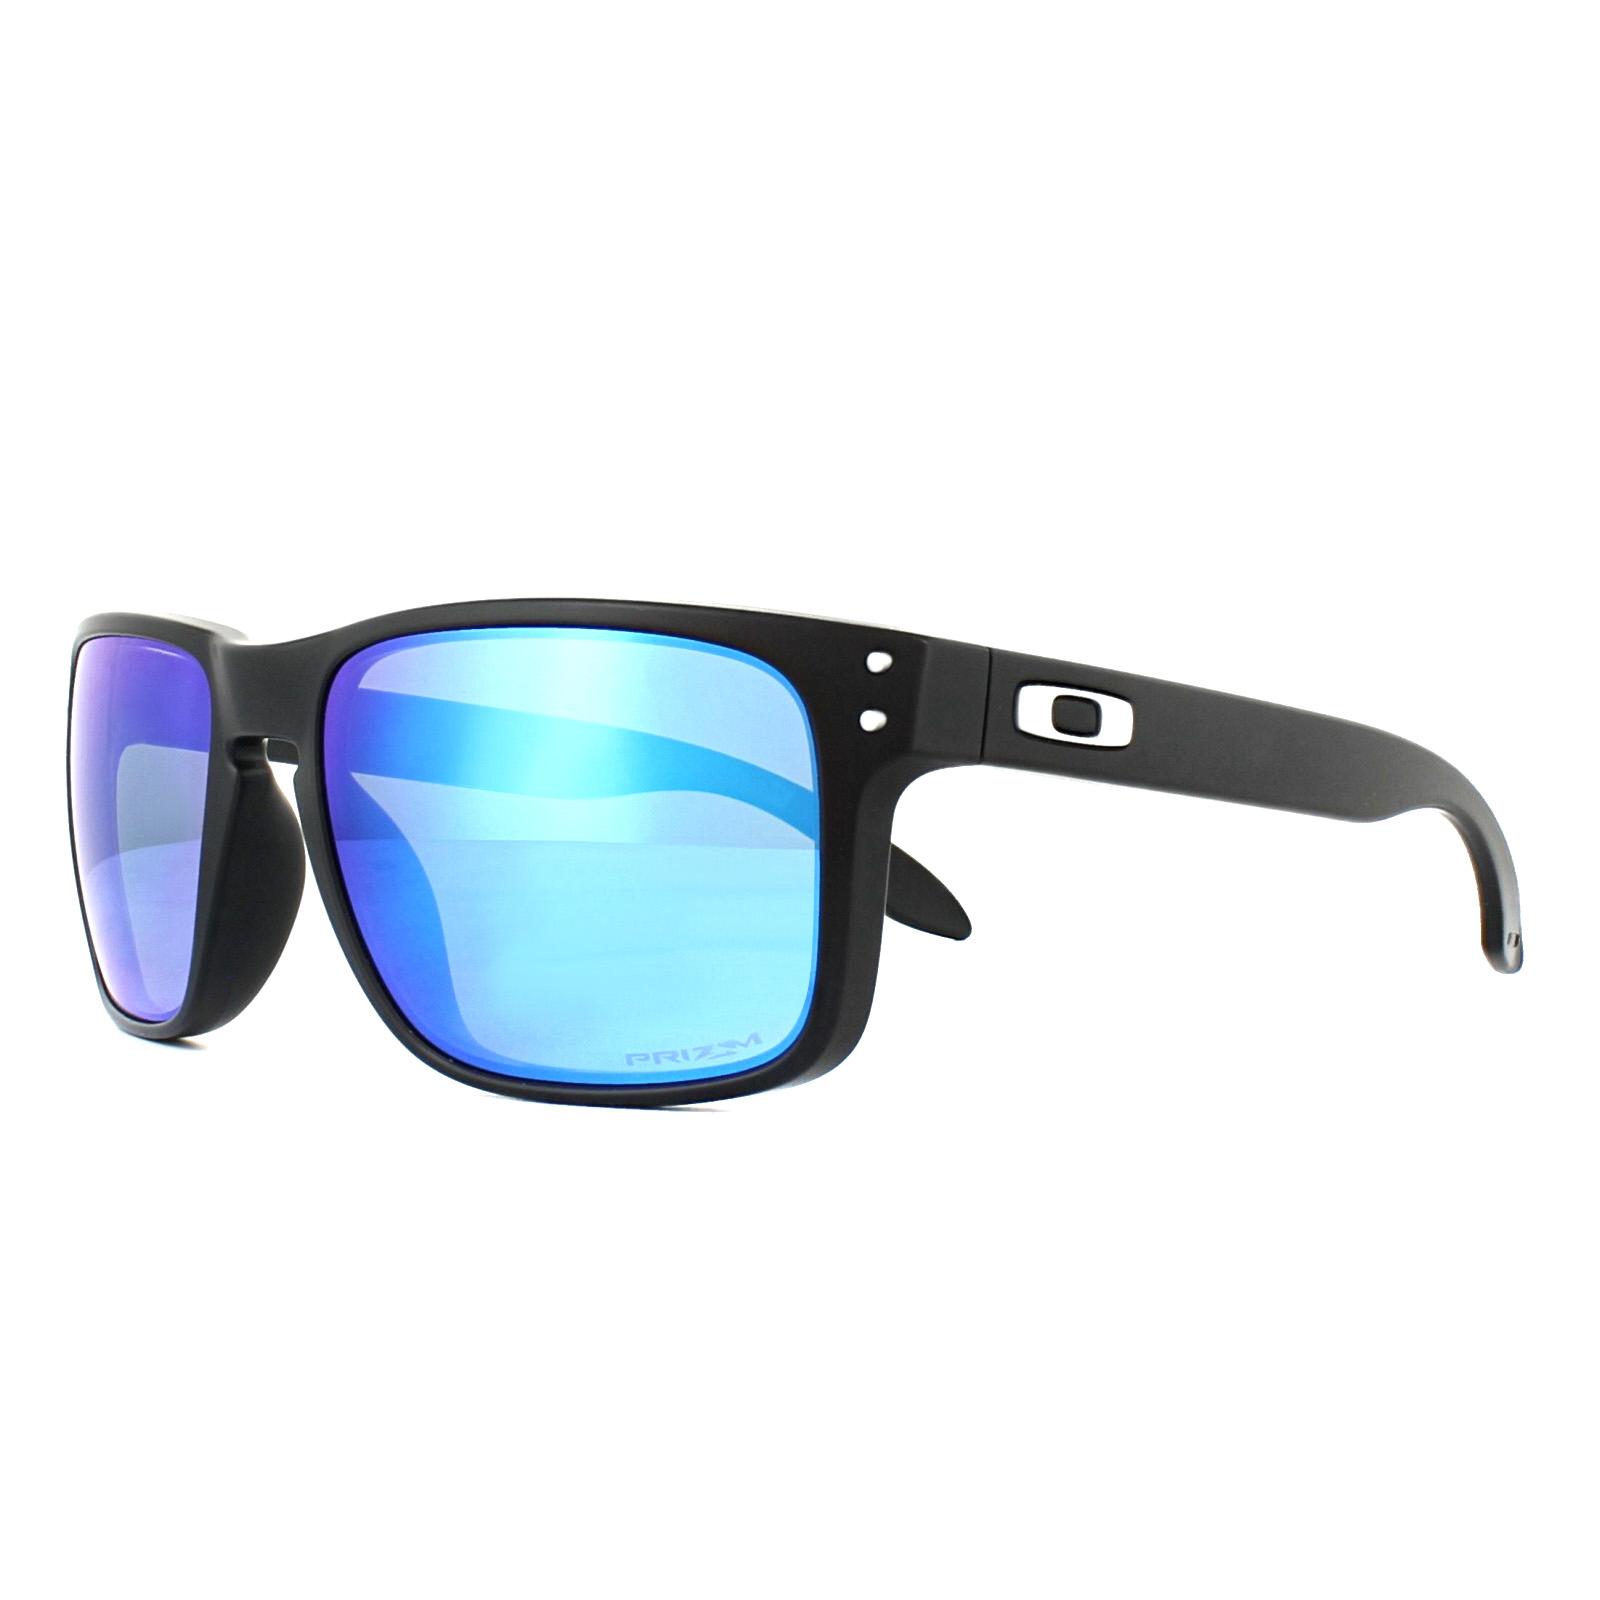 2404c0aad0 Sentinel Oakley Sunglasses Holbrook OO9102-F0 Matt Black Prizm Sapphire  Polarized